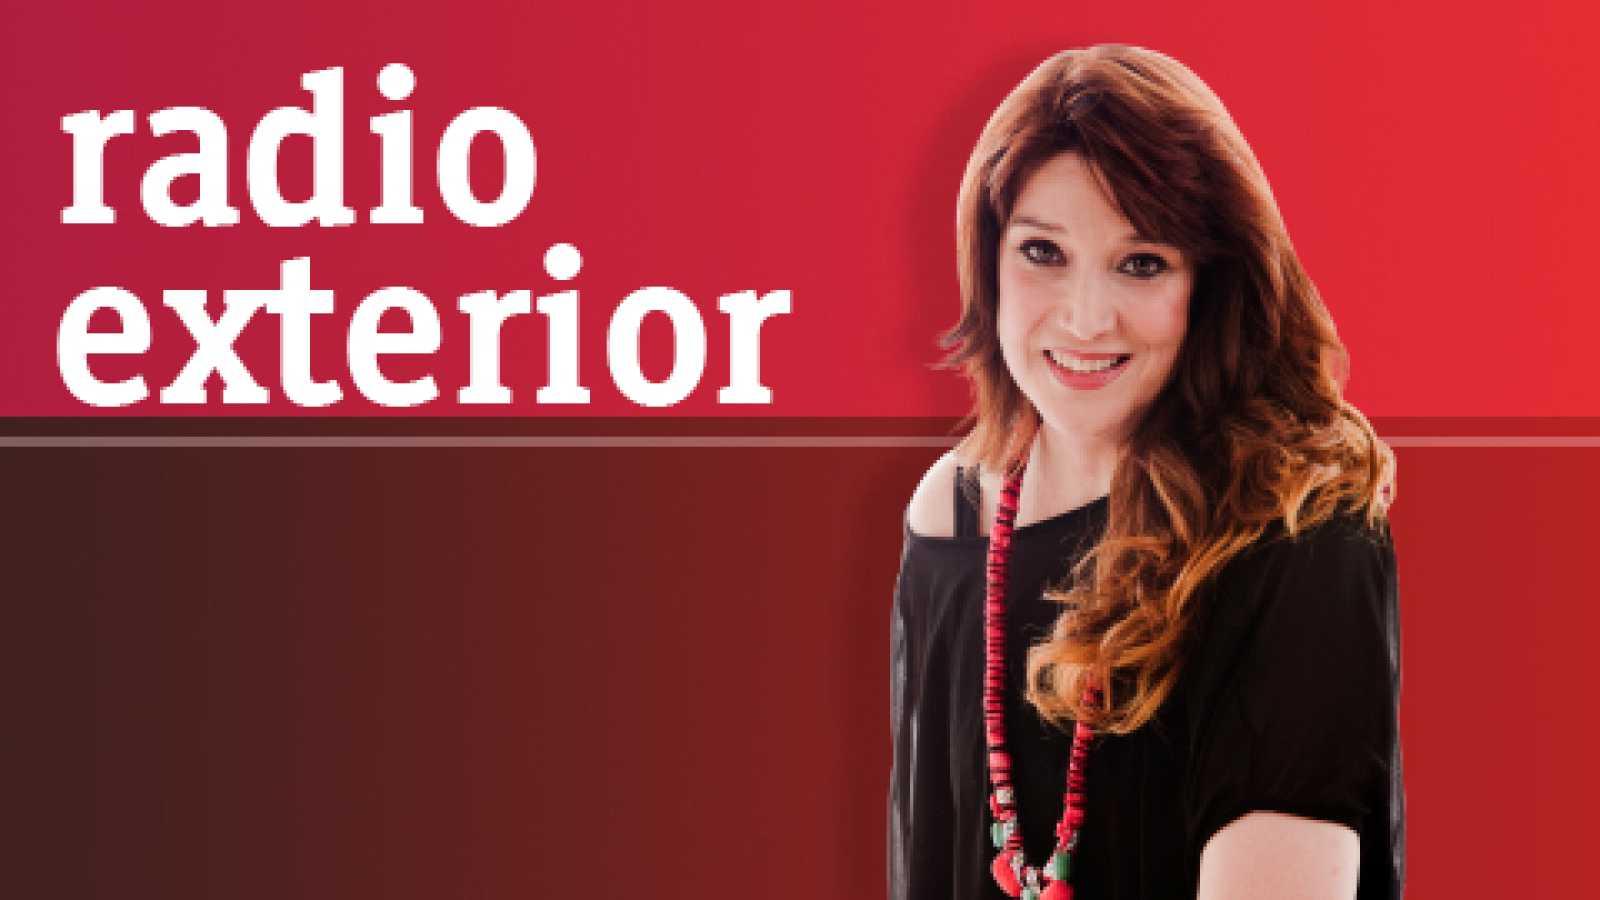 España.com en REE - 17/10/17 - escuchar ahora